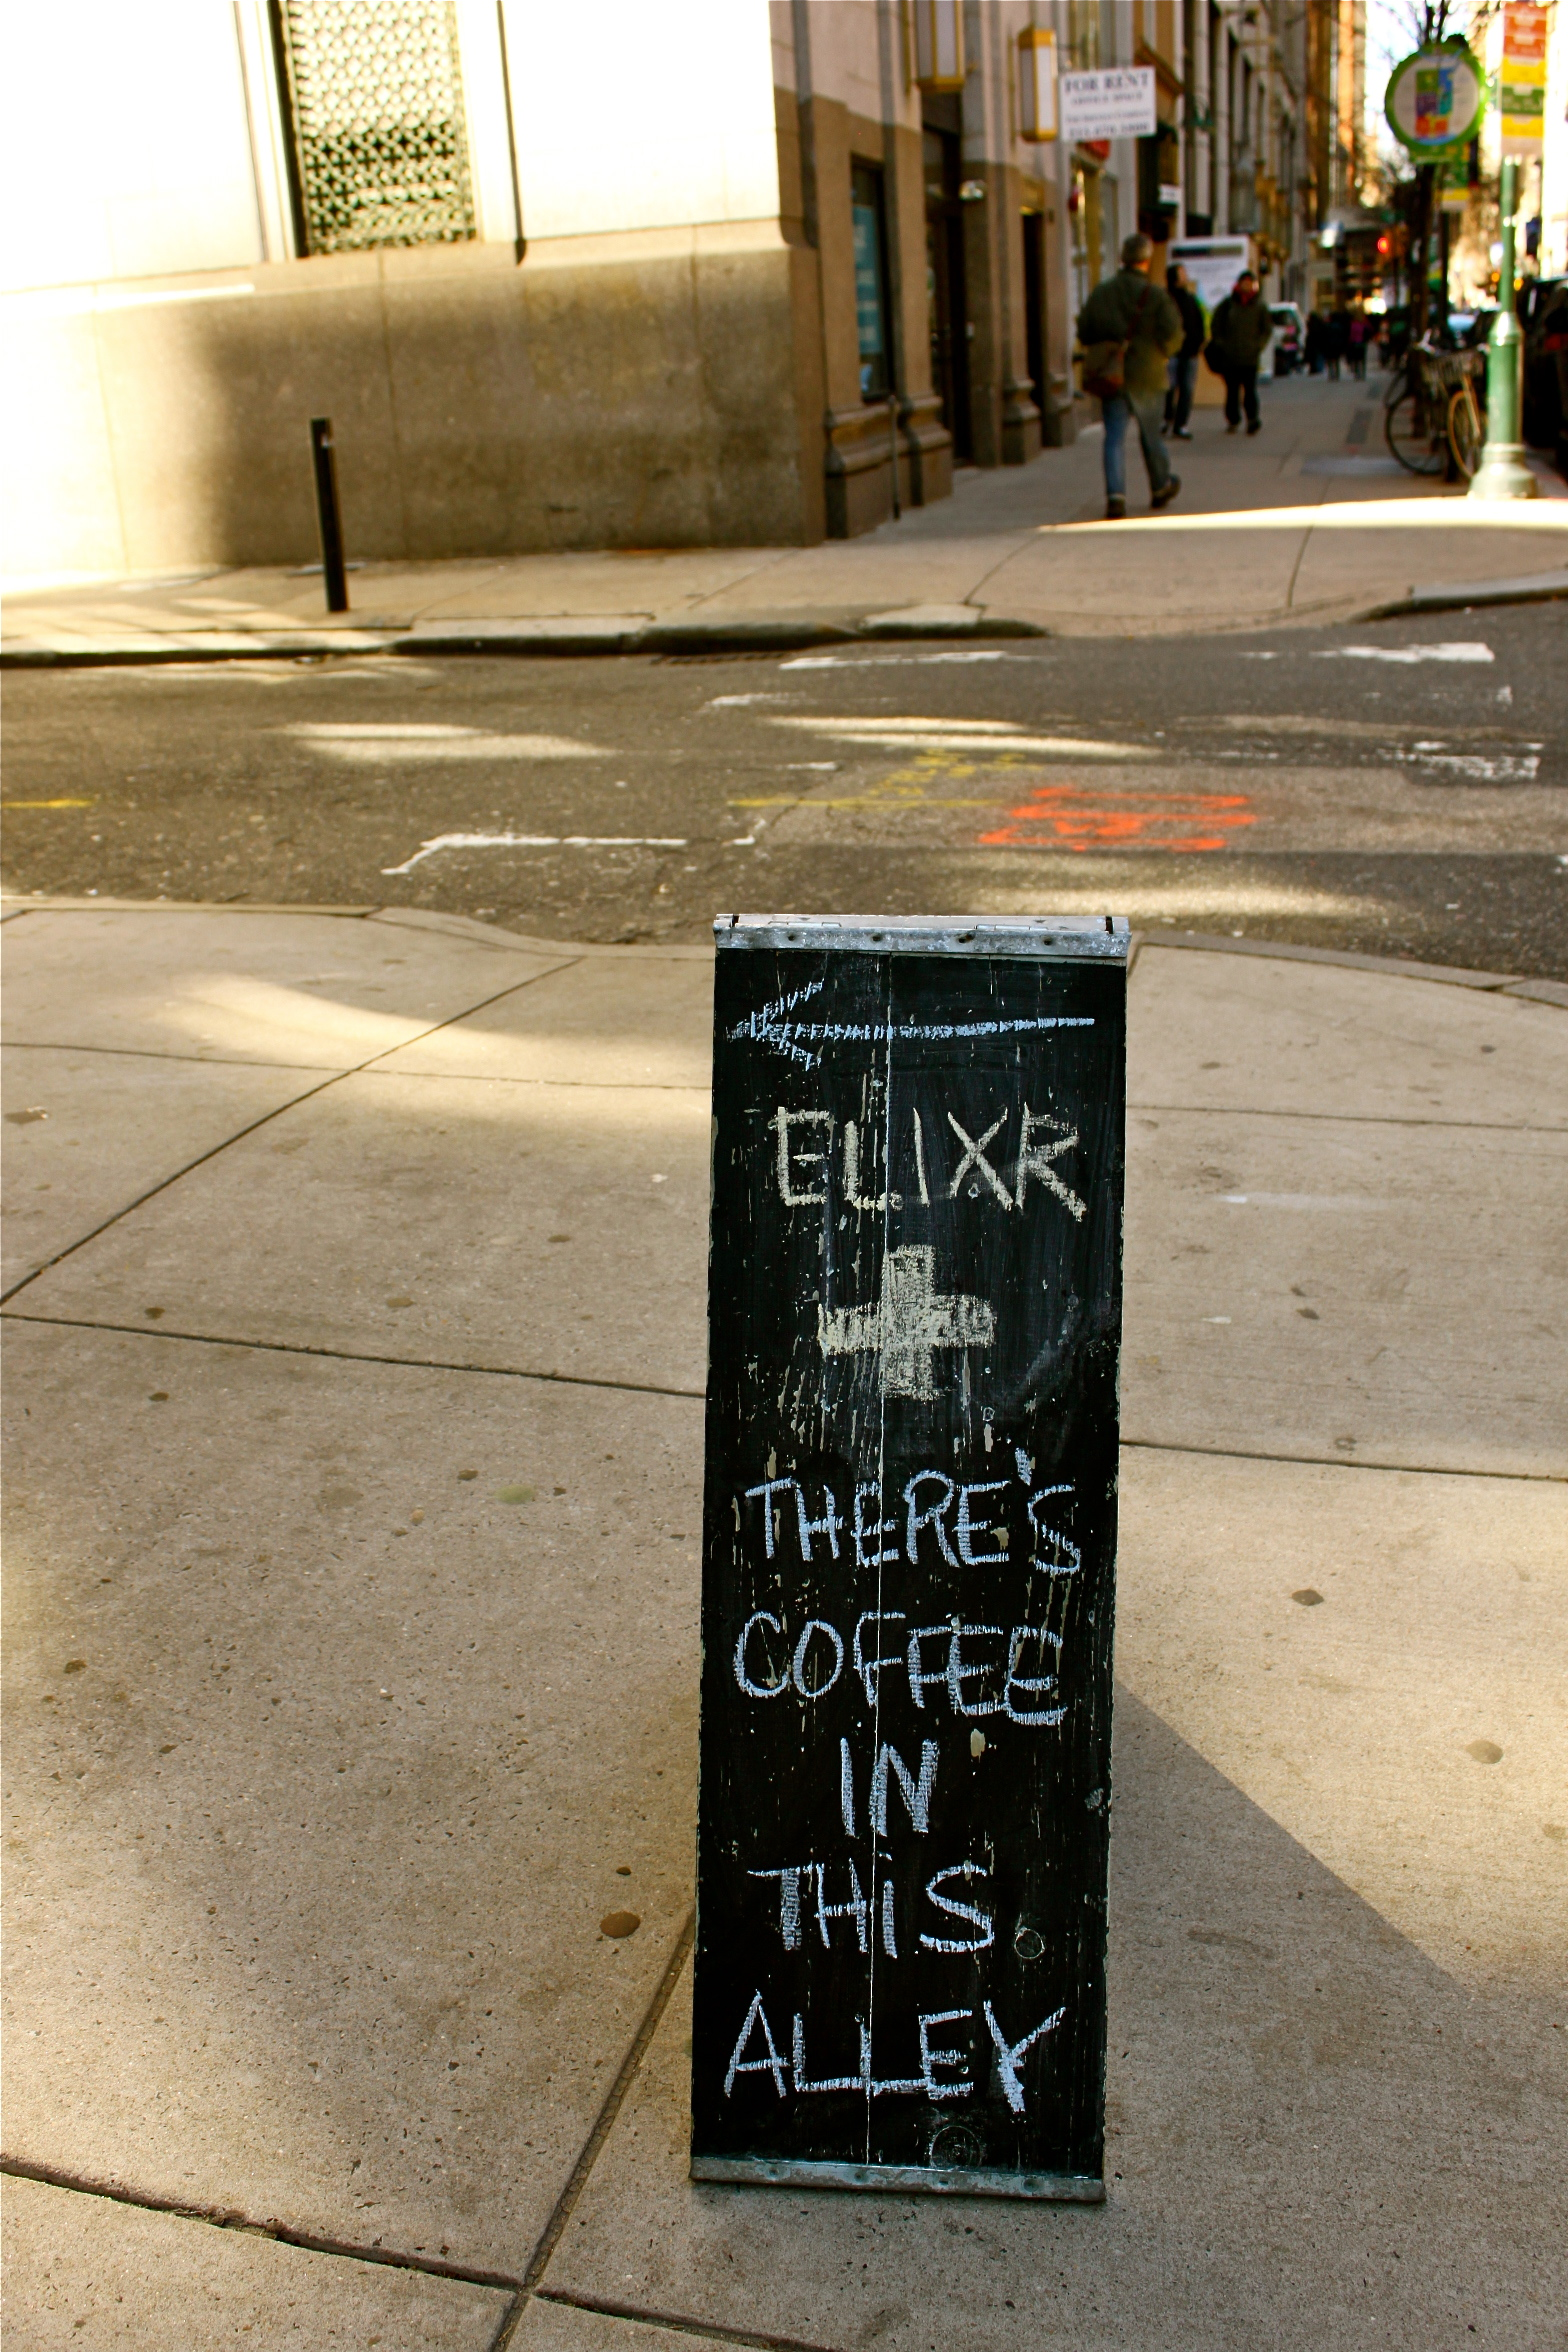 elixr coffee philadelphia pennsylvania